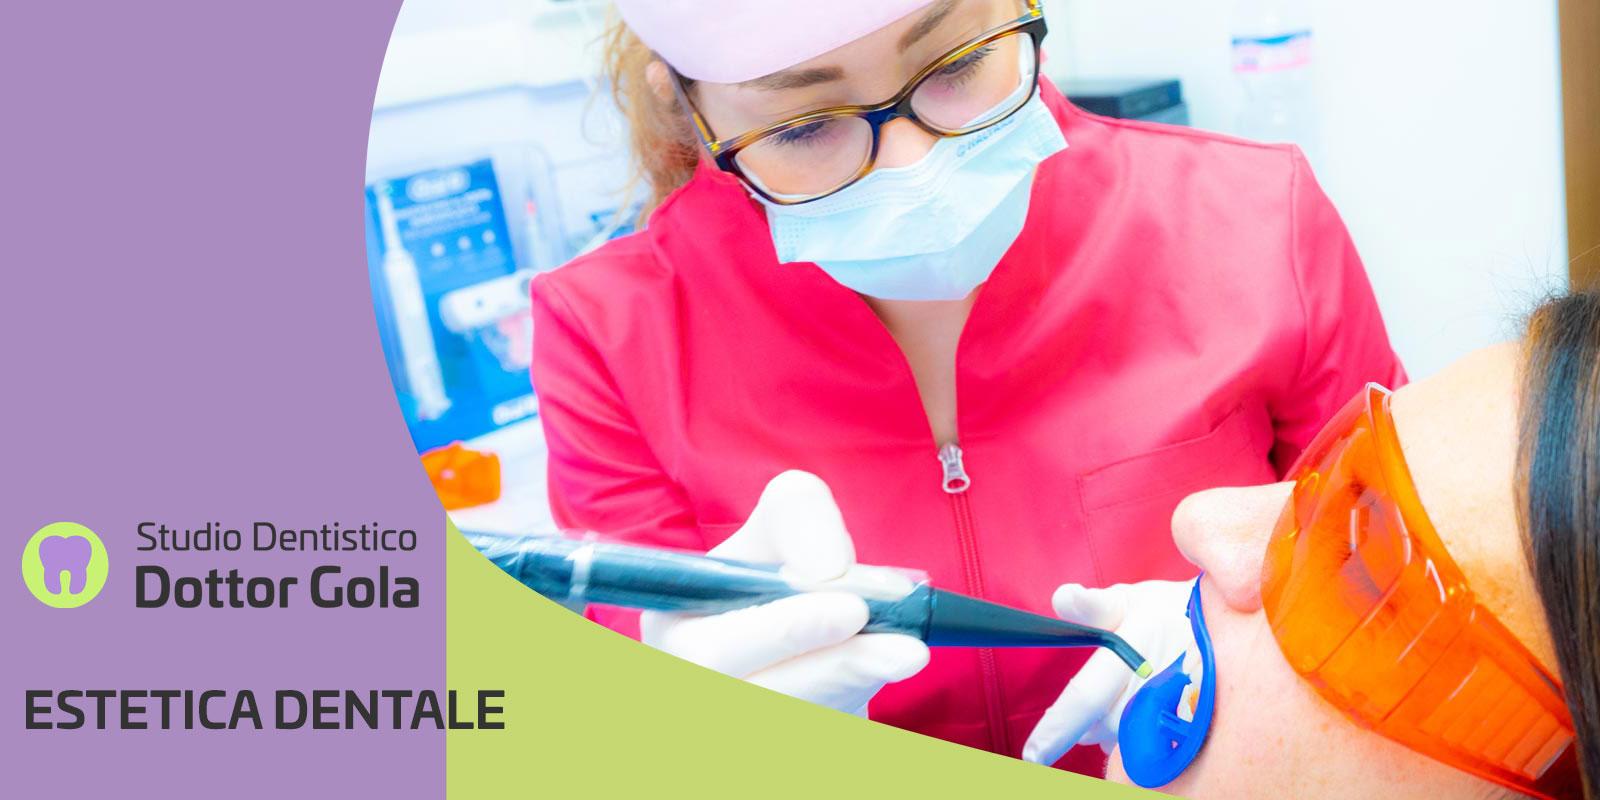 estetica-dentale-dentista-gola-casteggio-pavia